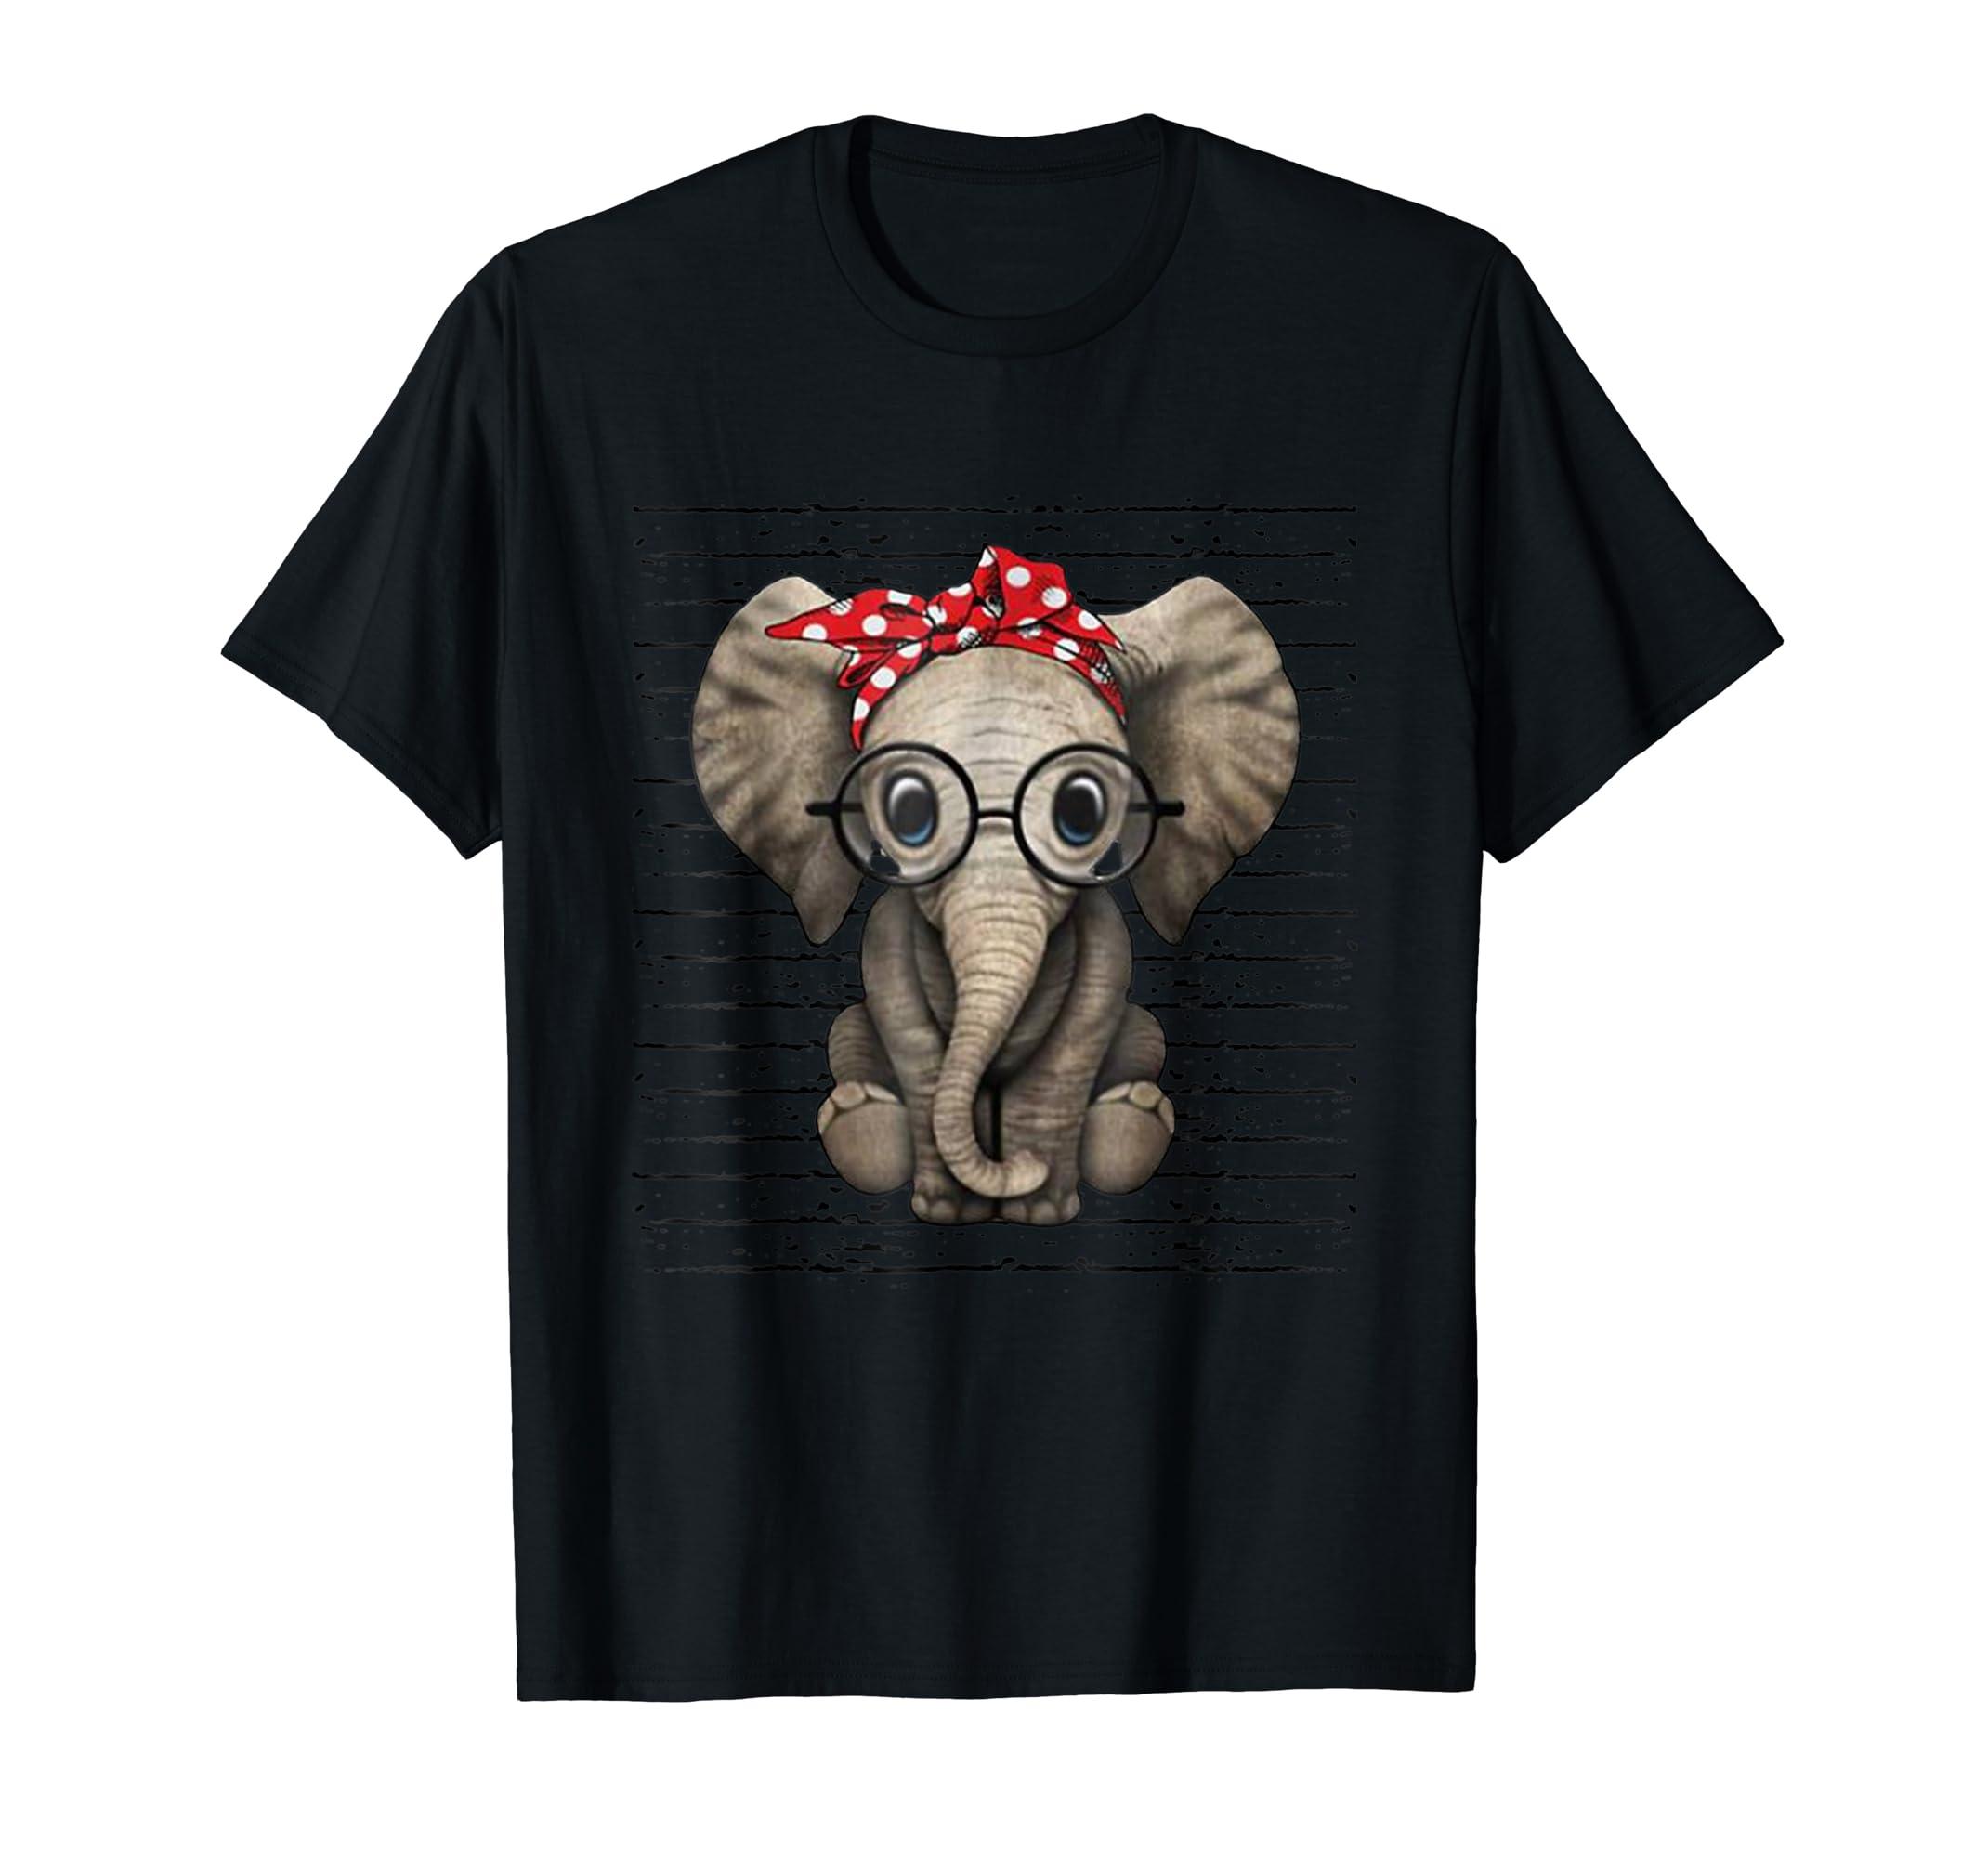 Elephants with bandana headband and glasses cute t-shirt-Men's T-Shirt-Black